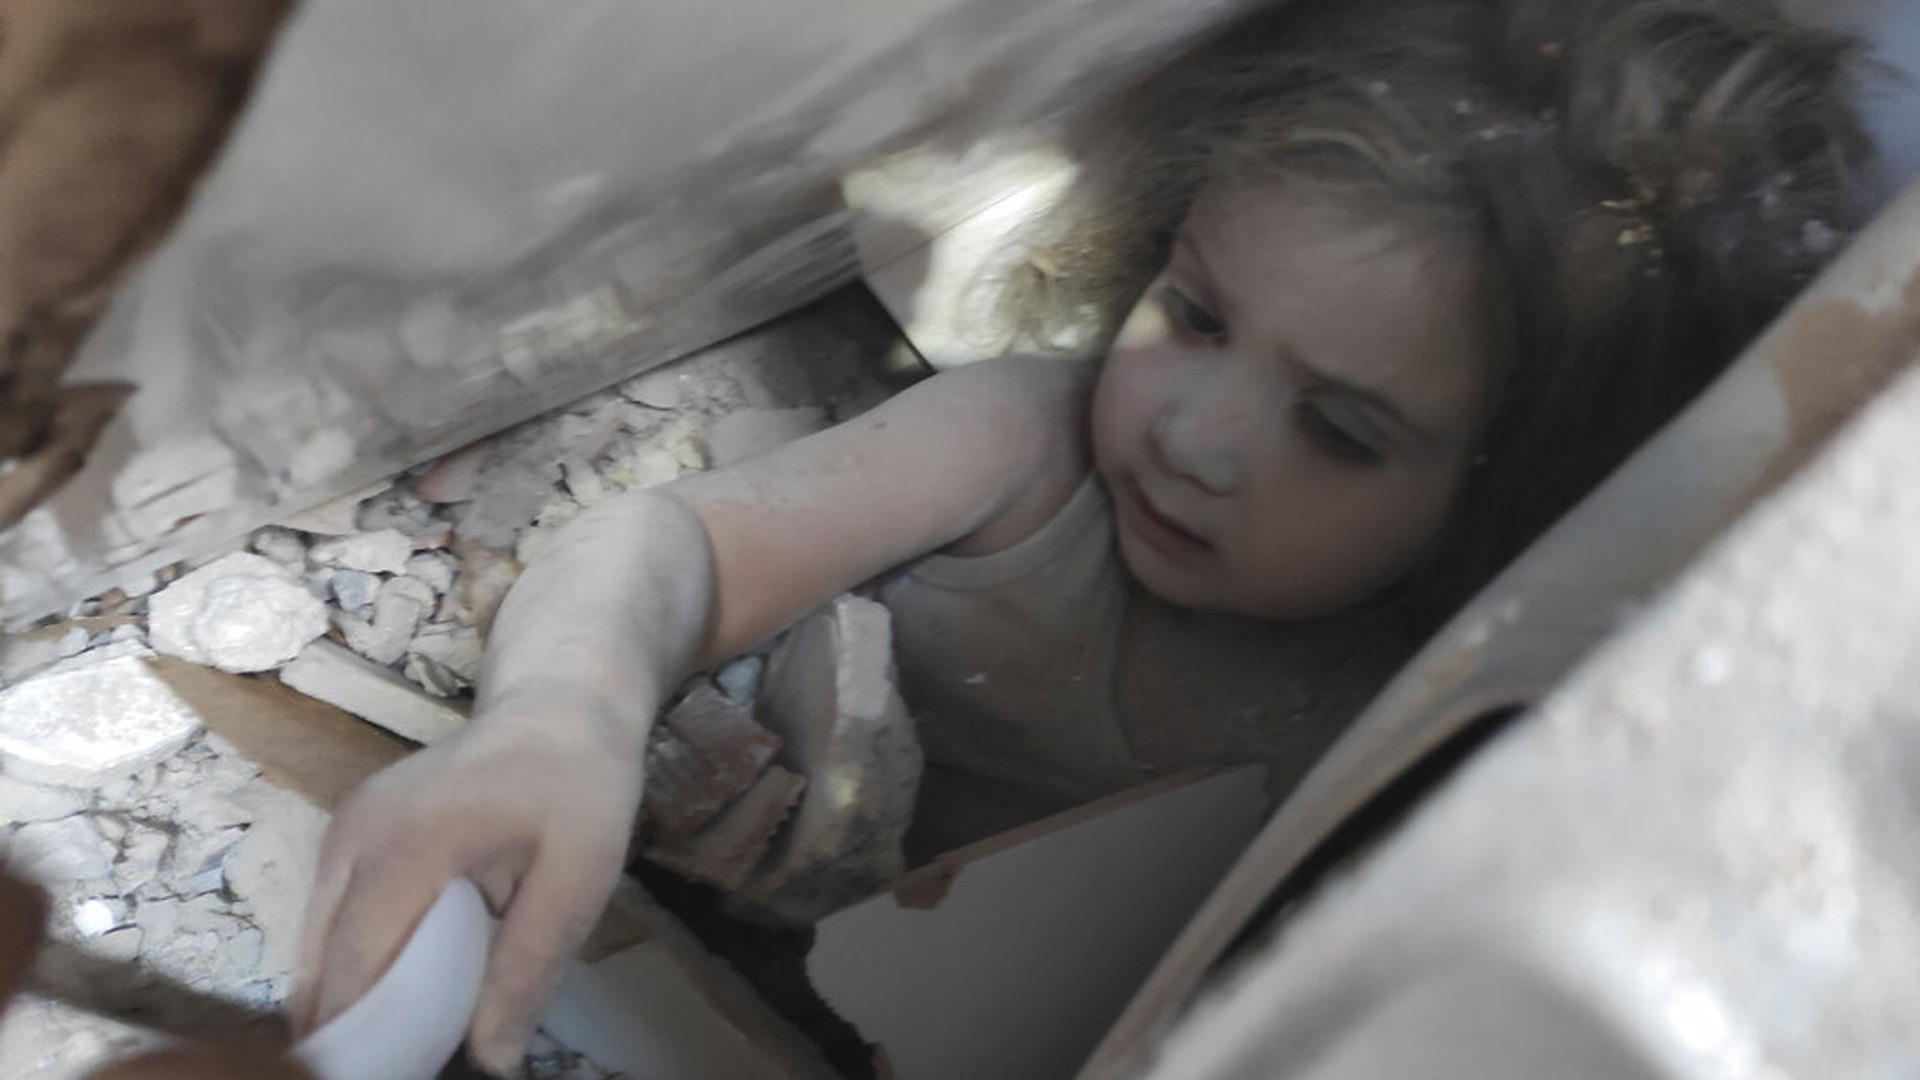 Girl rescued from rubble in Turkey